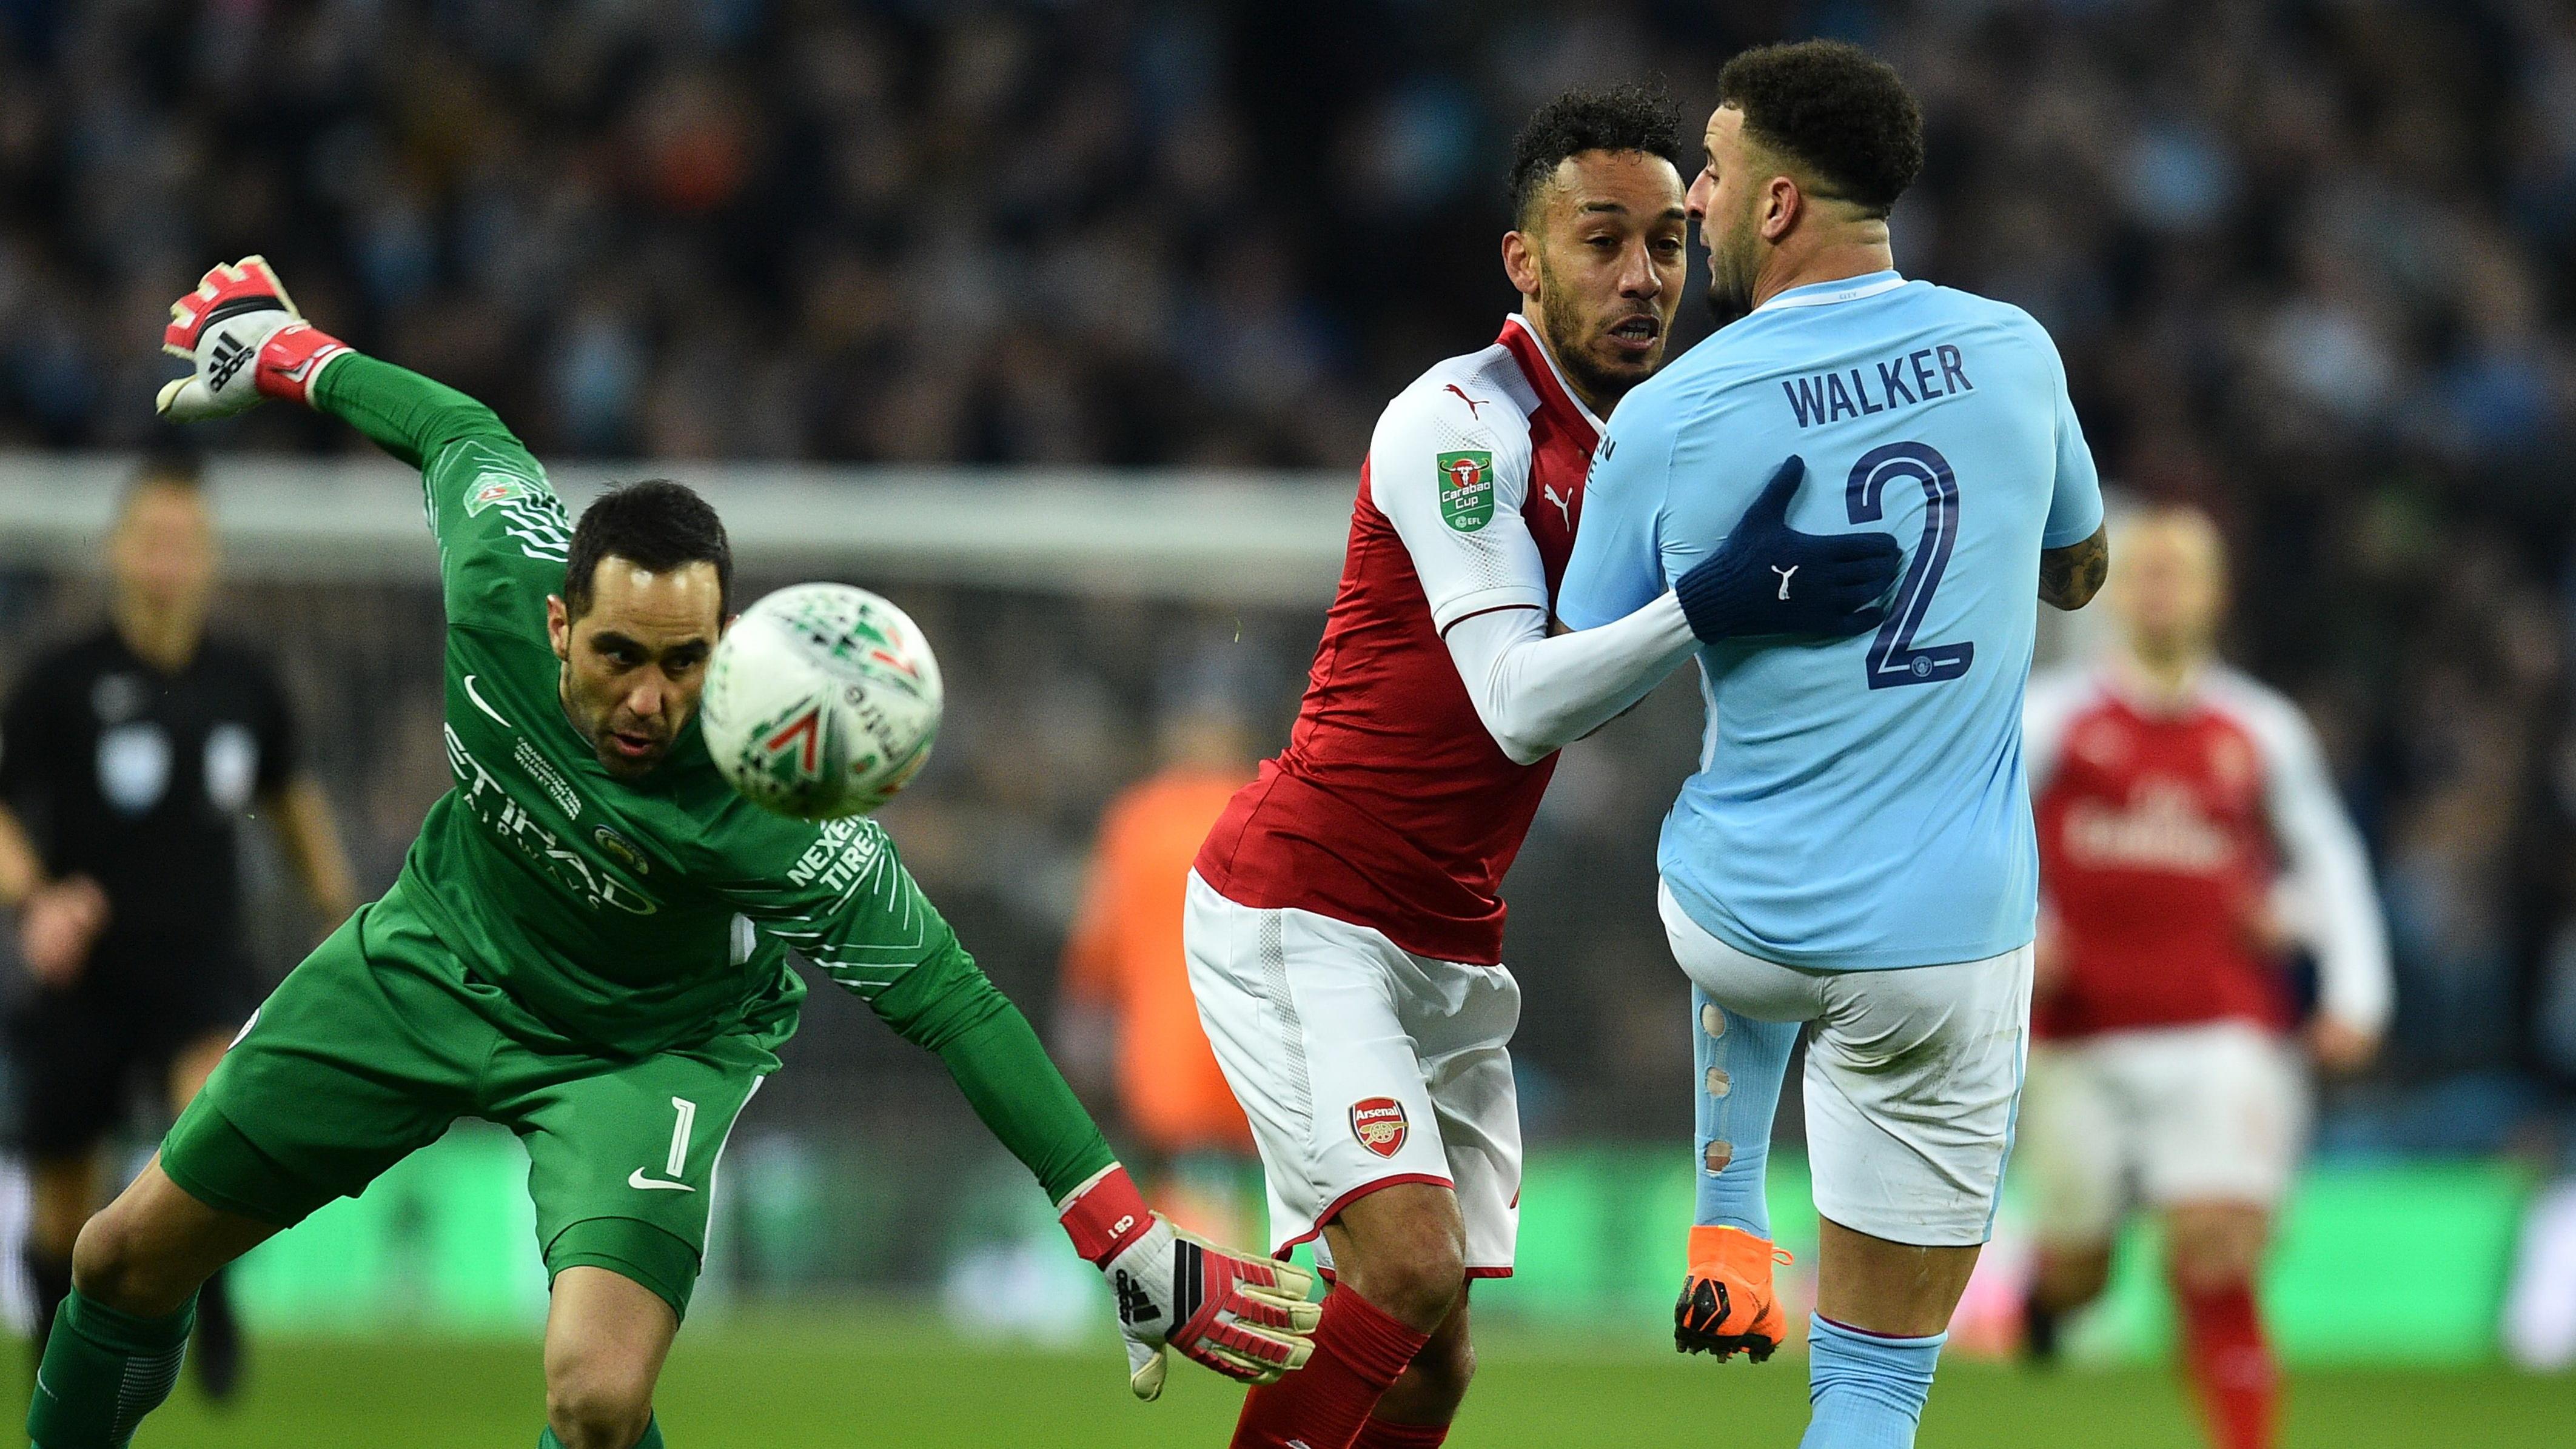 Pierre Emerick Aubameyang Arsenal Claudio Bravo Manchester City